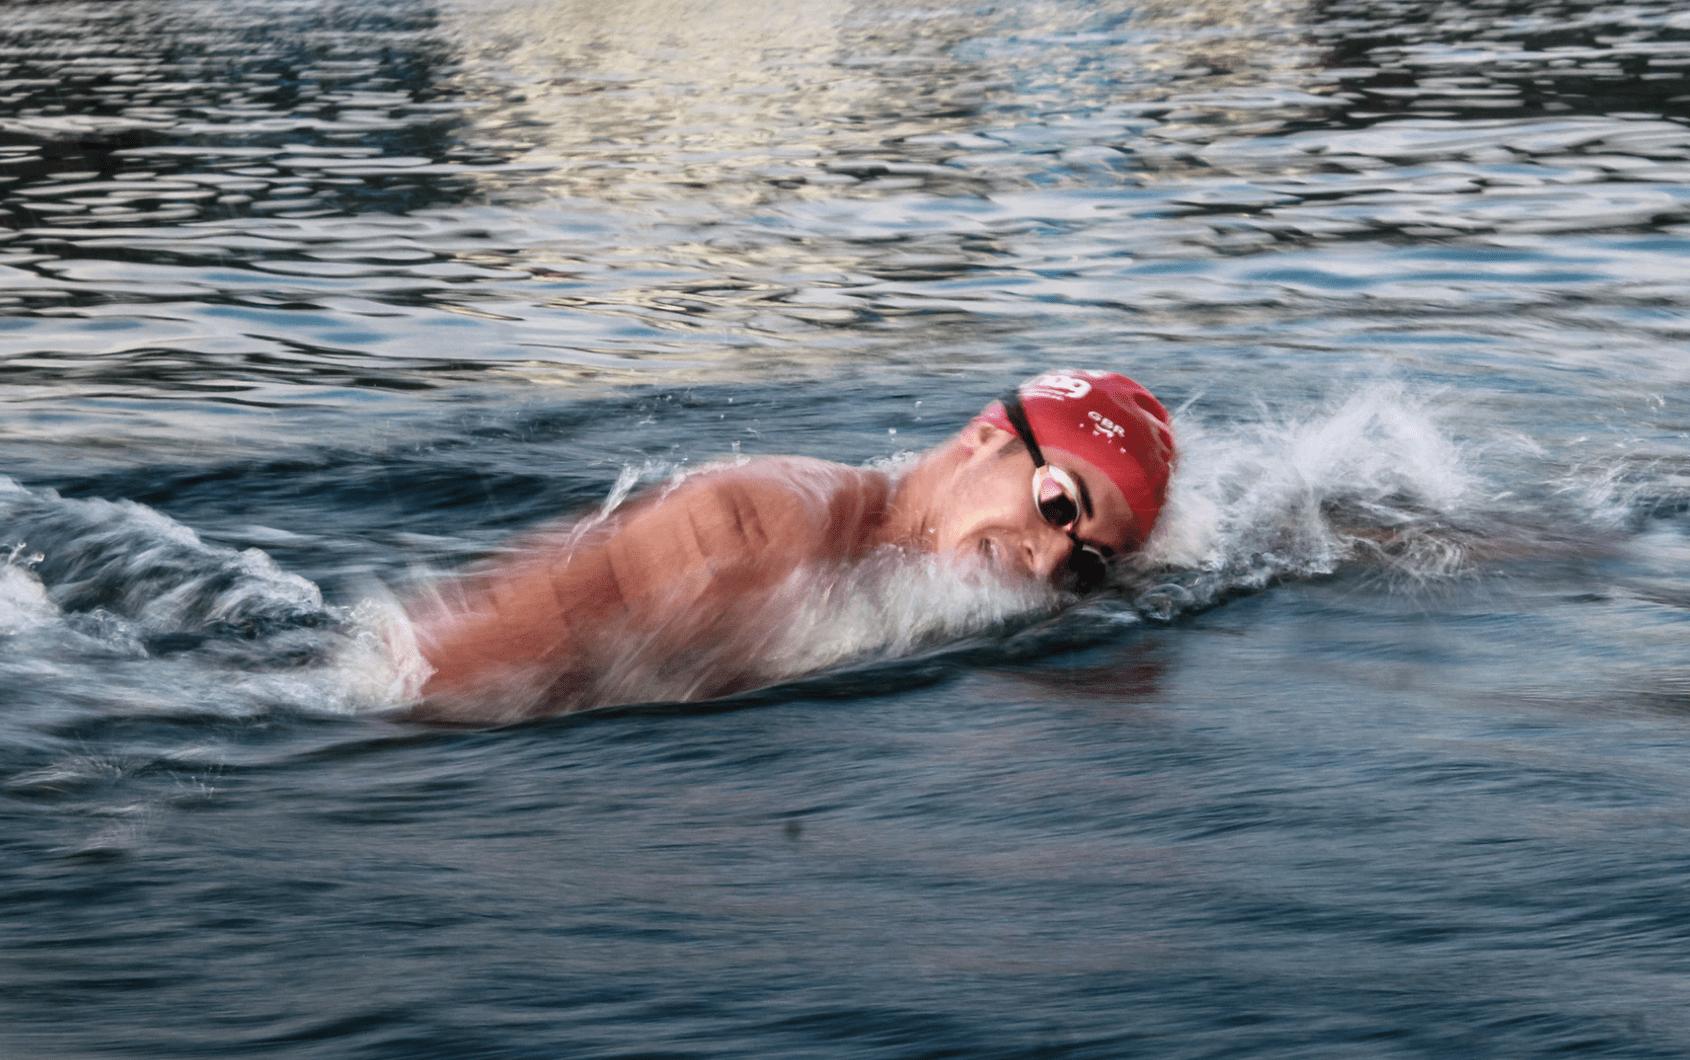 man swimming on body of water during daytime